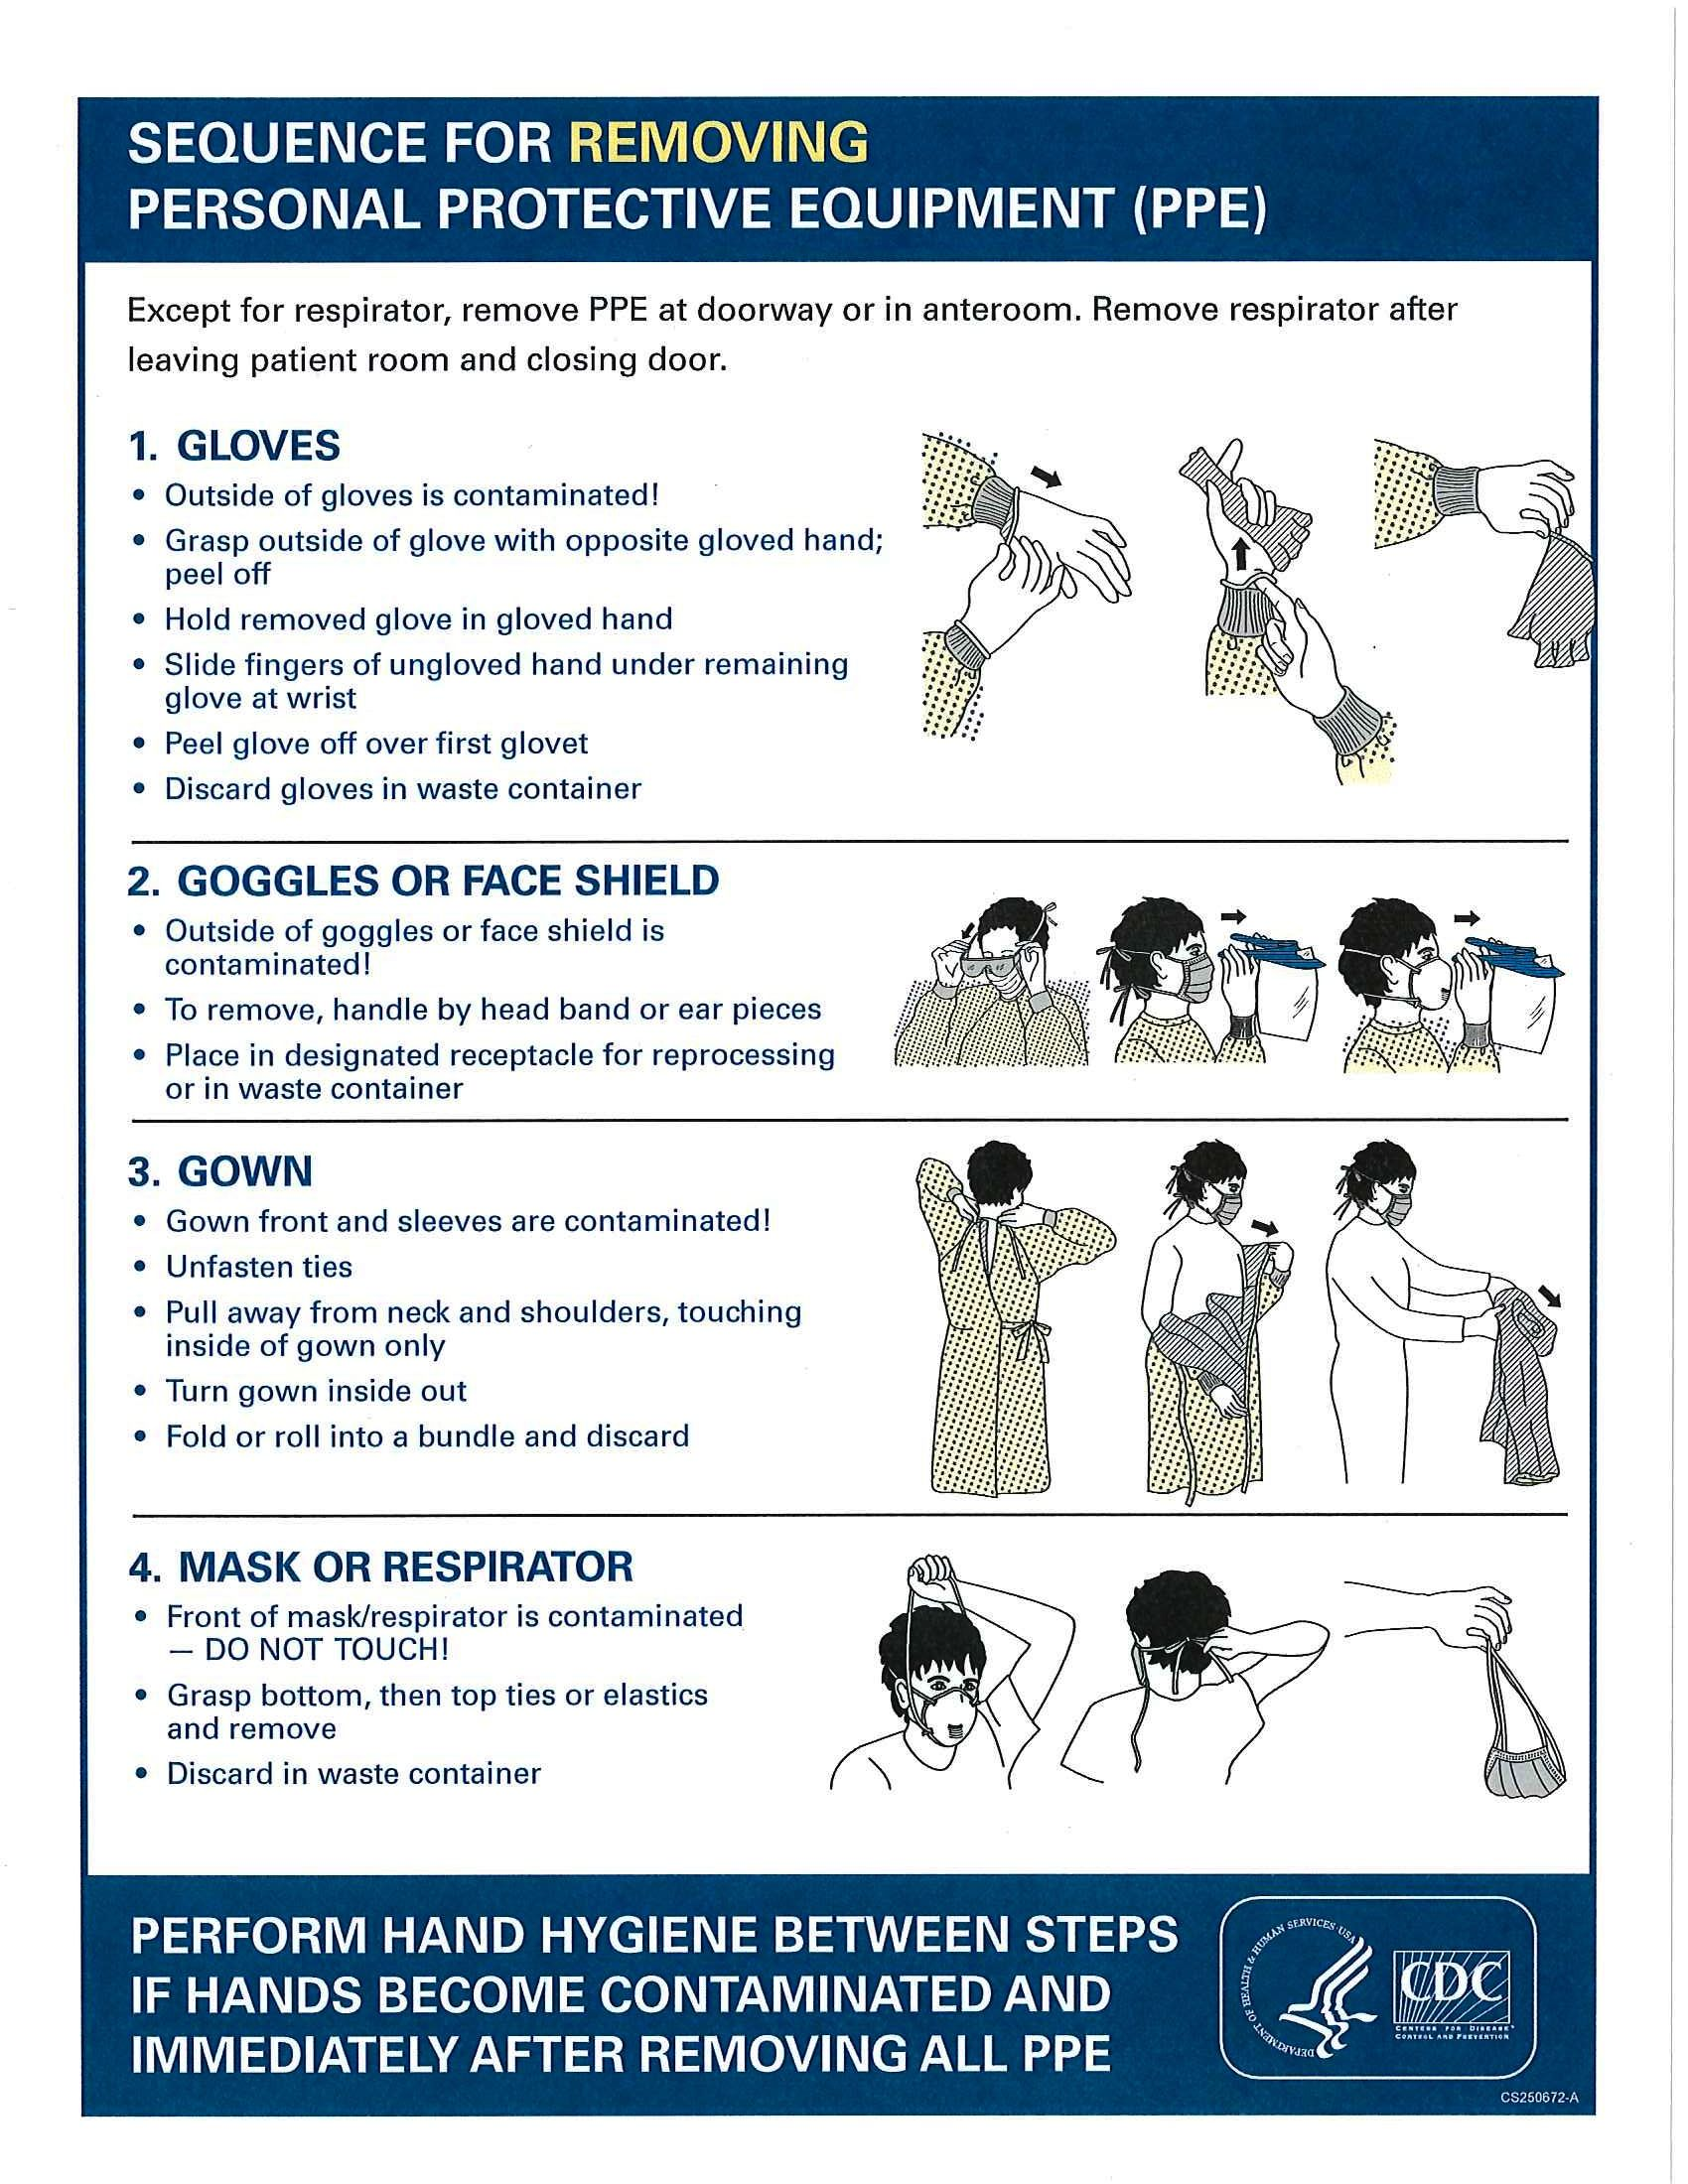 http//www.cdc.gov/vhf/ebola/pdf/ppeposter.pdf CDC's